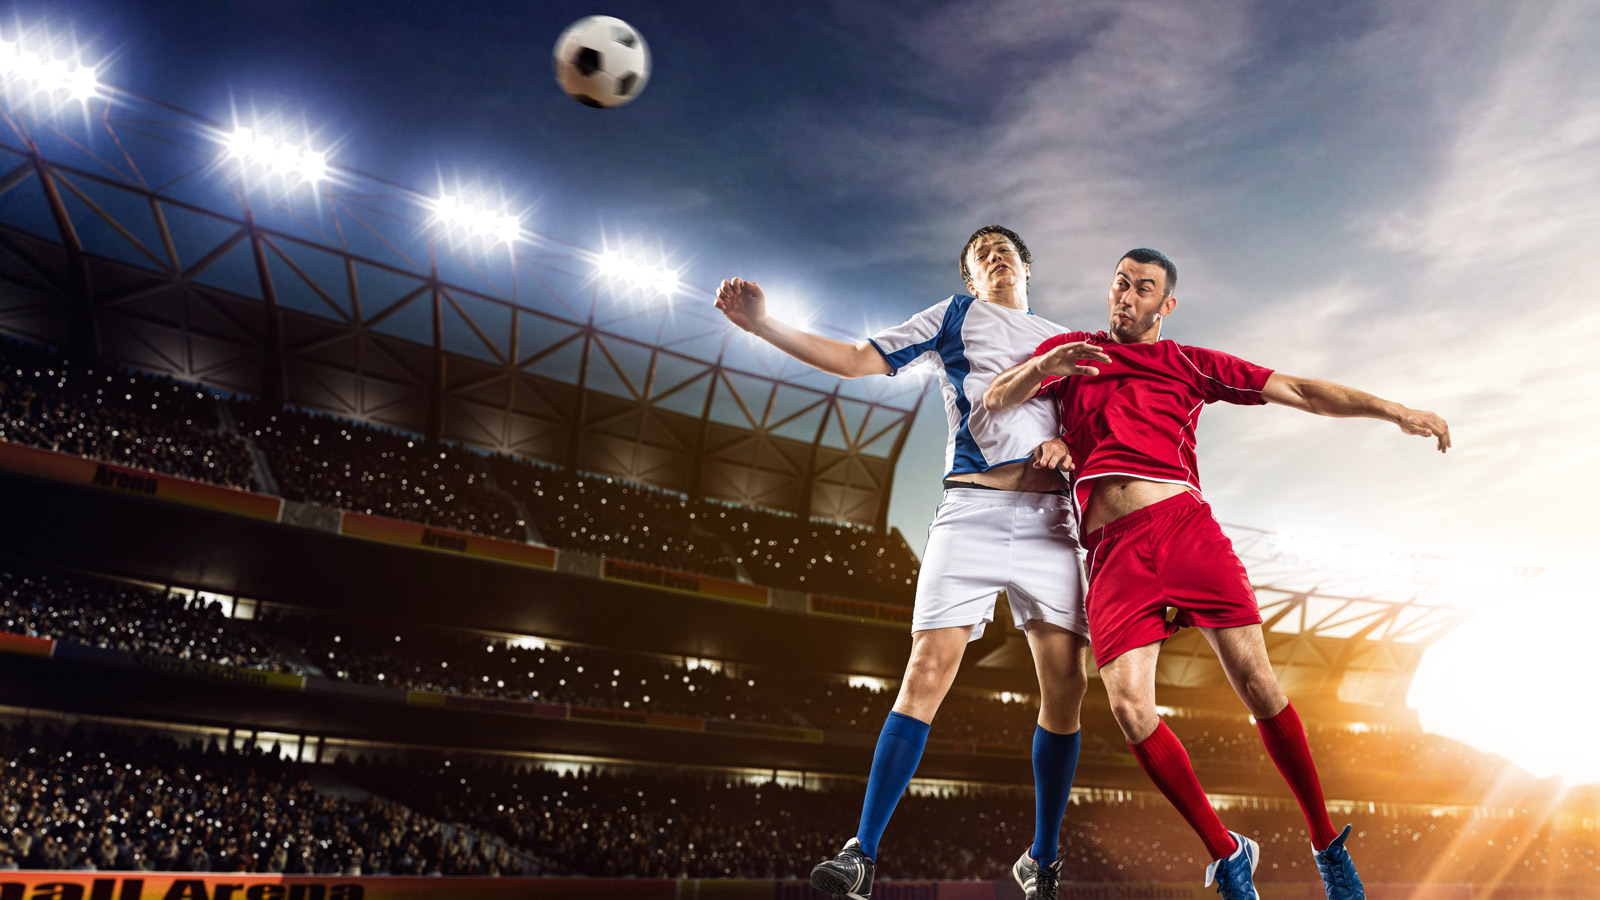 Betting types football hewitt vs duckworth betting expert predictions